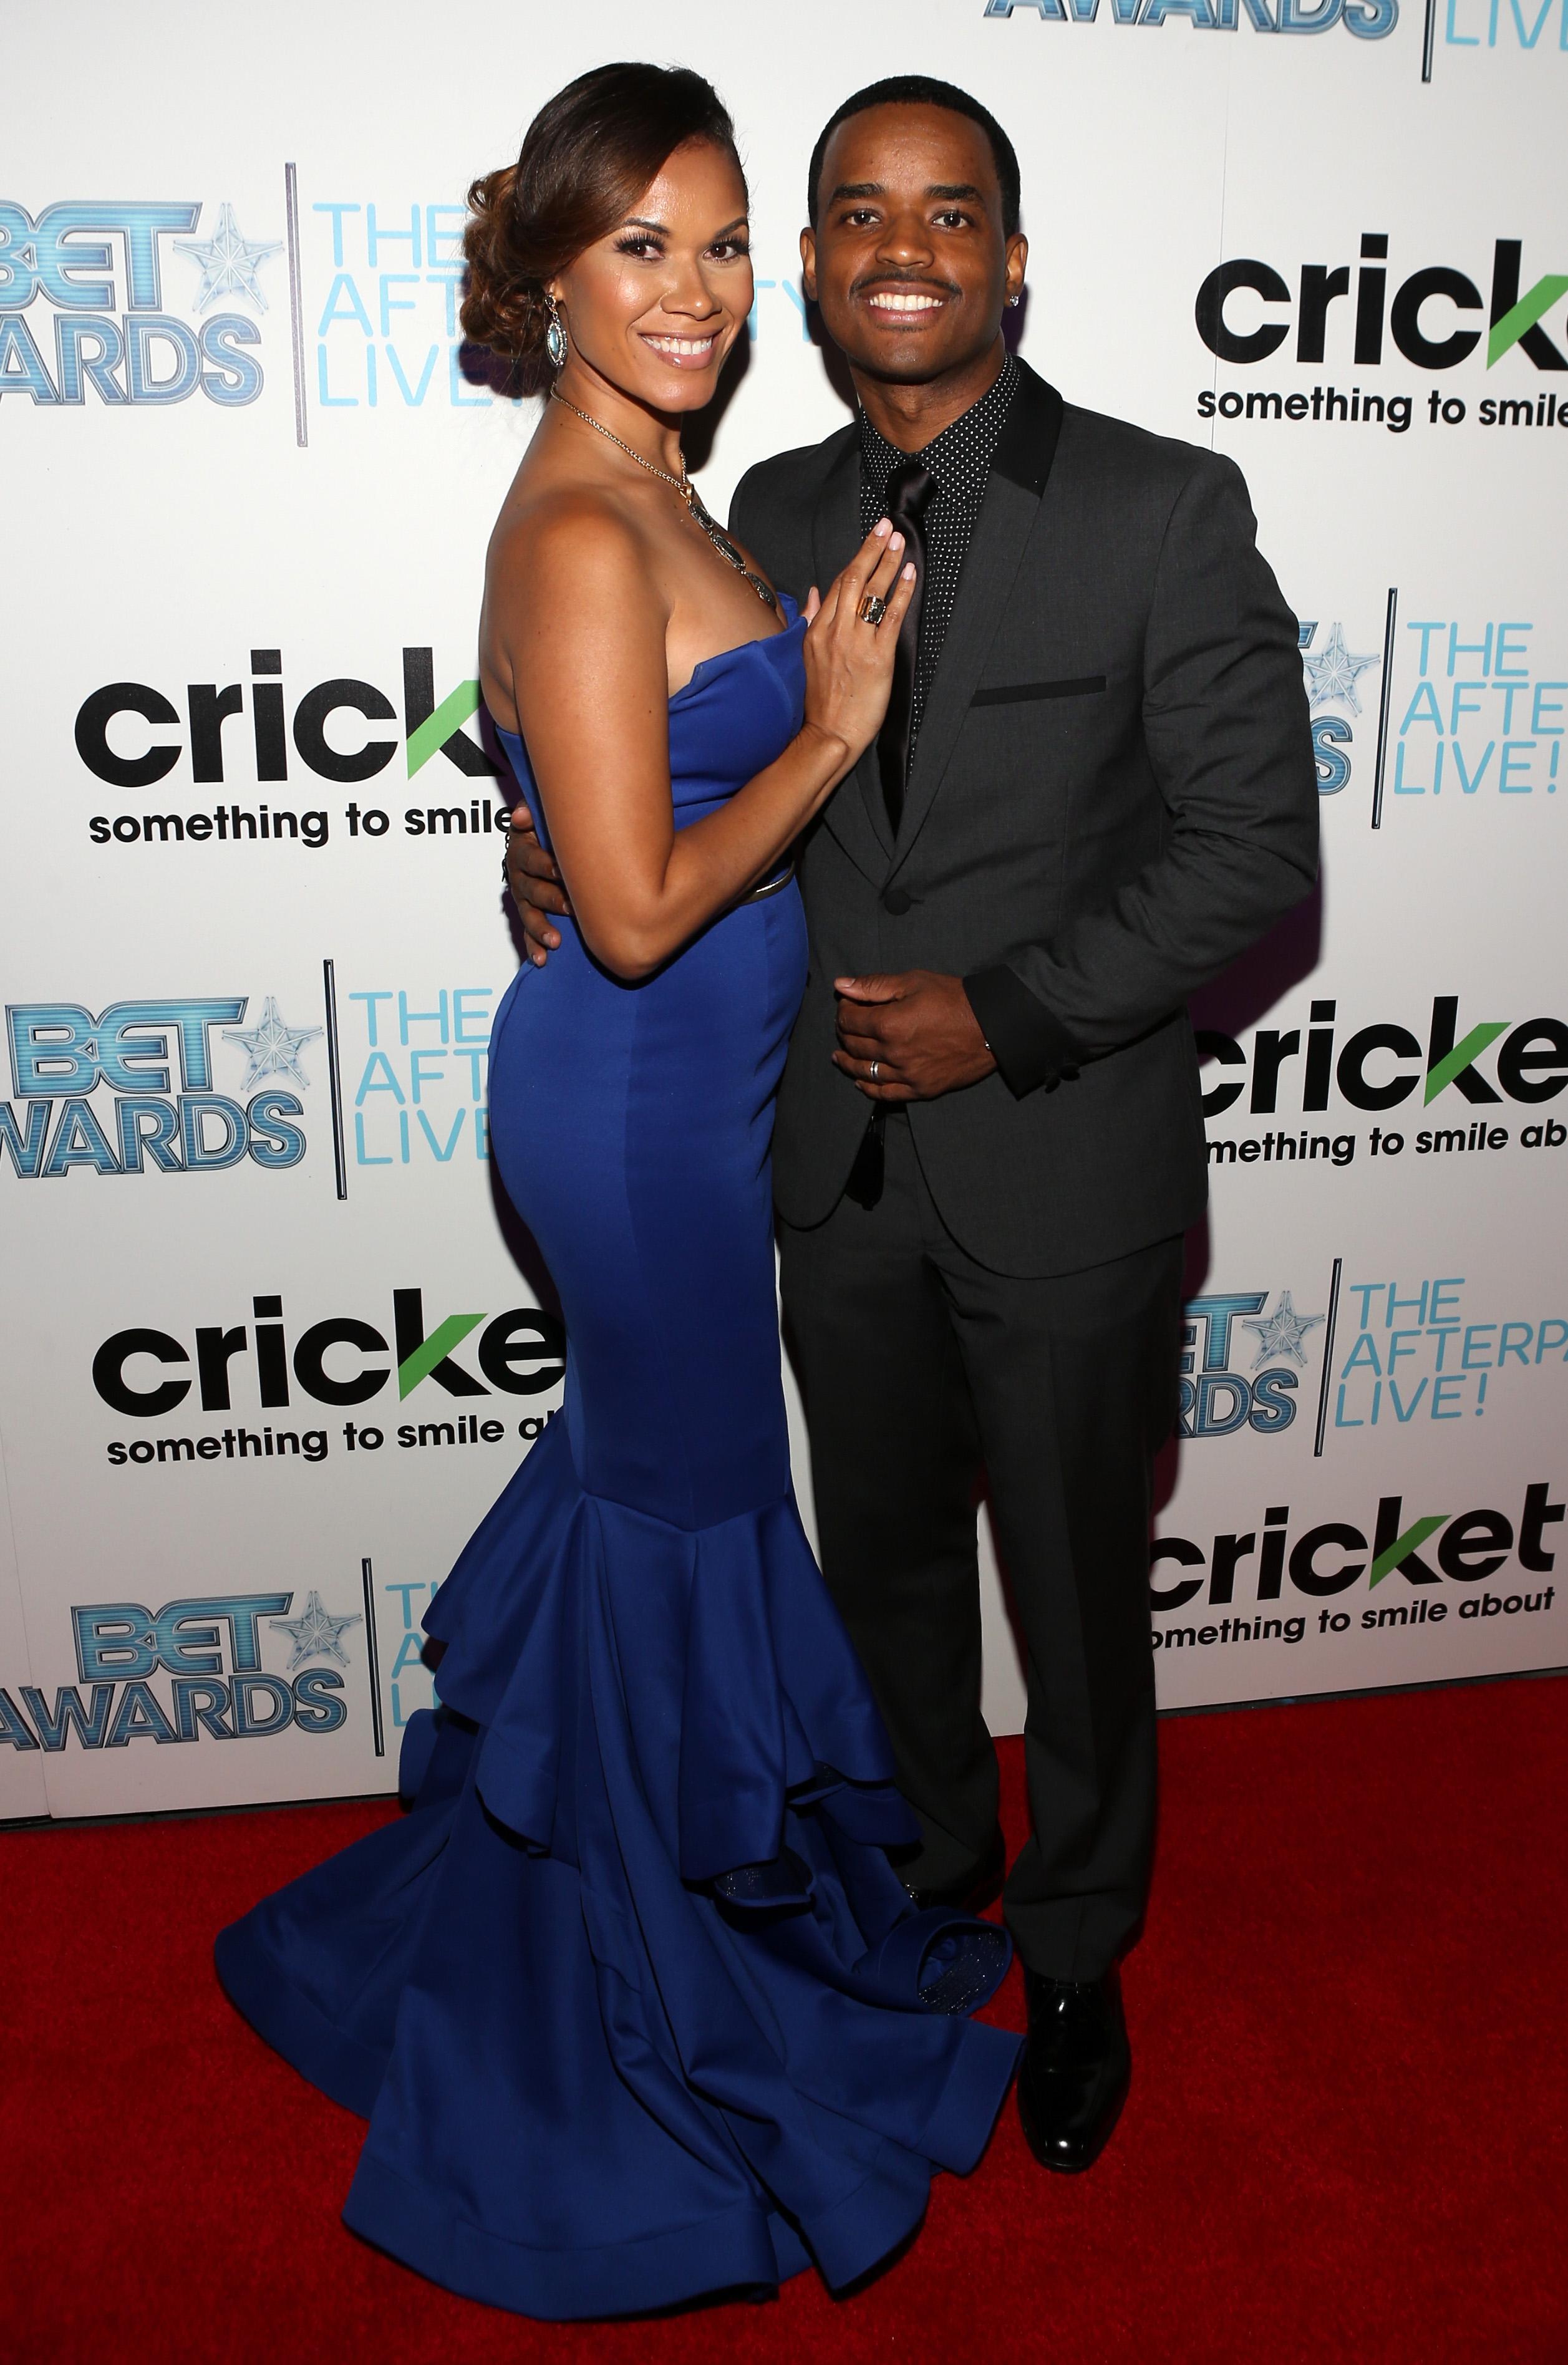 Larenz Tate Celebrates 10 Years Of Marriage His Real Life Love Jones Praise Cleveland Choisissez parmi des contenus premium tomasina parrott de la plus haute qualité. larenz tate celebrates 10 years of